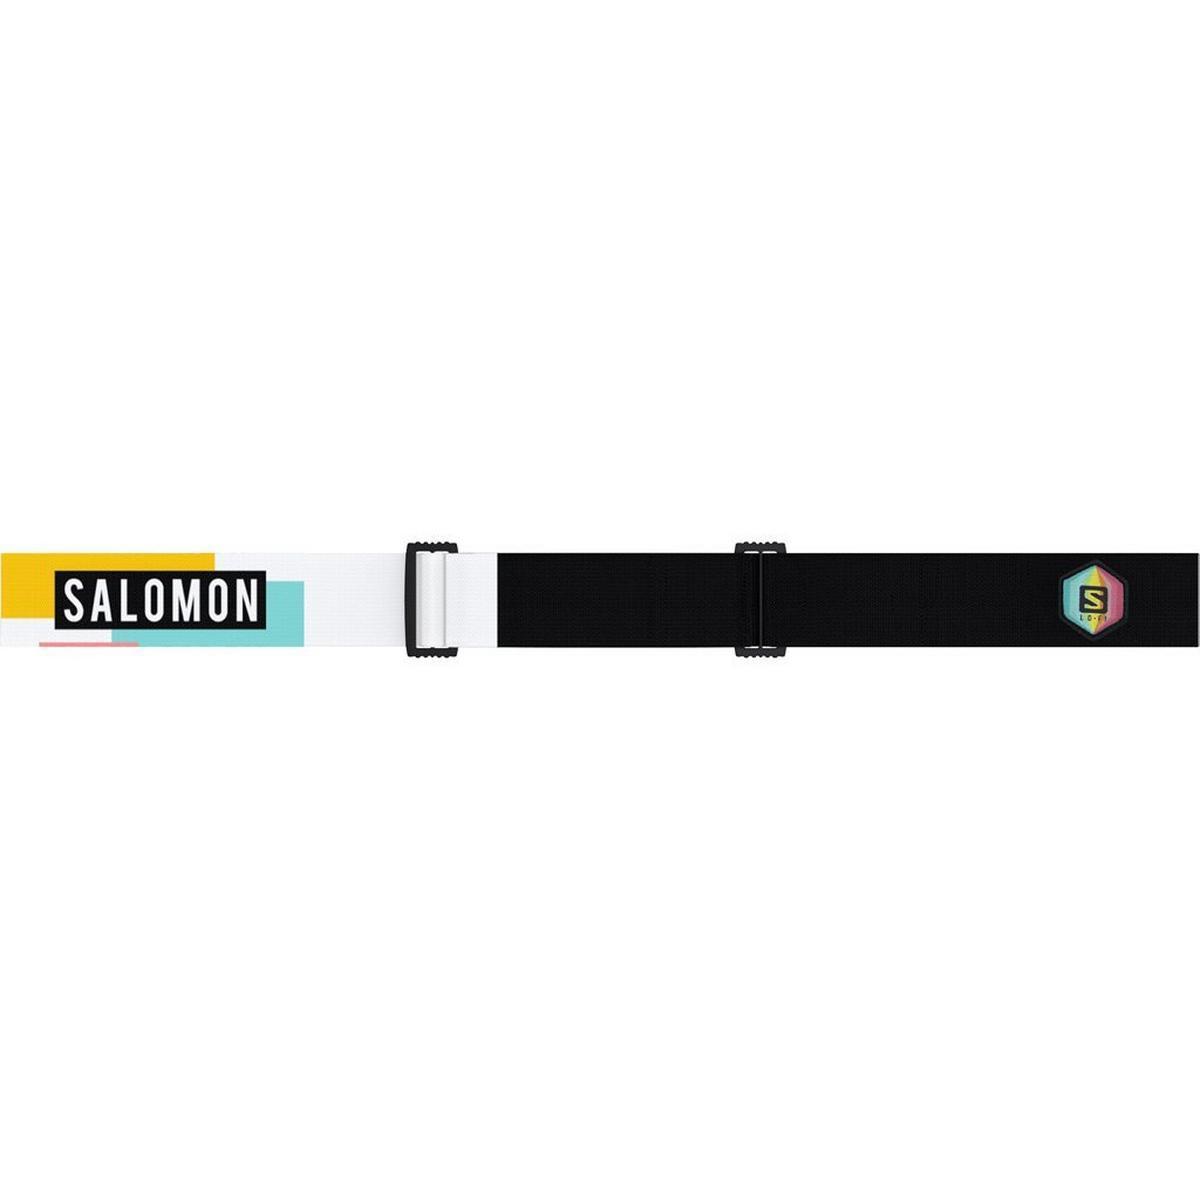 Salomon Ski Goggles LO FI SIGMA Black-Safran/Uni.Pop Cat 3